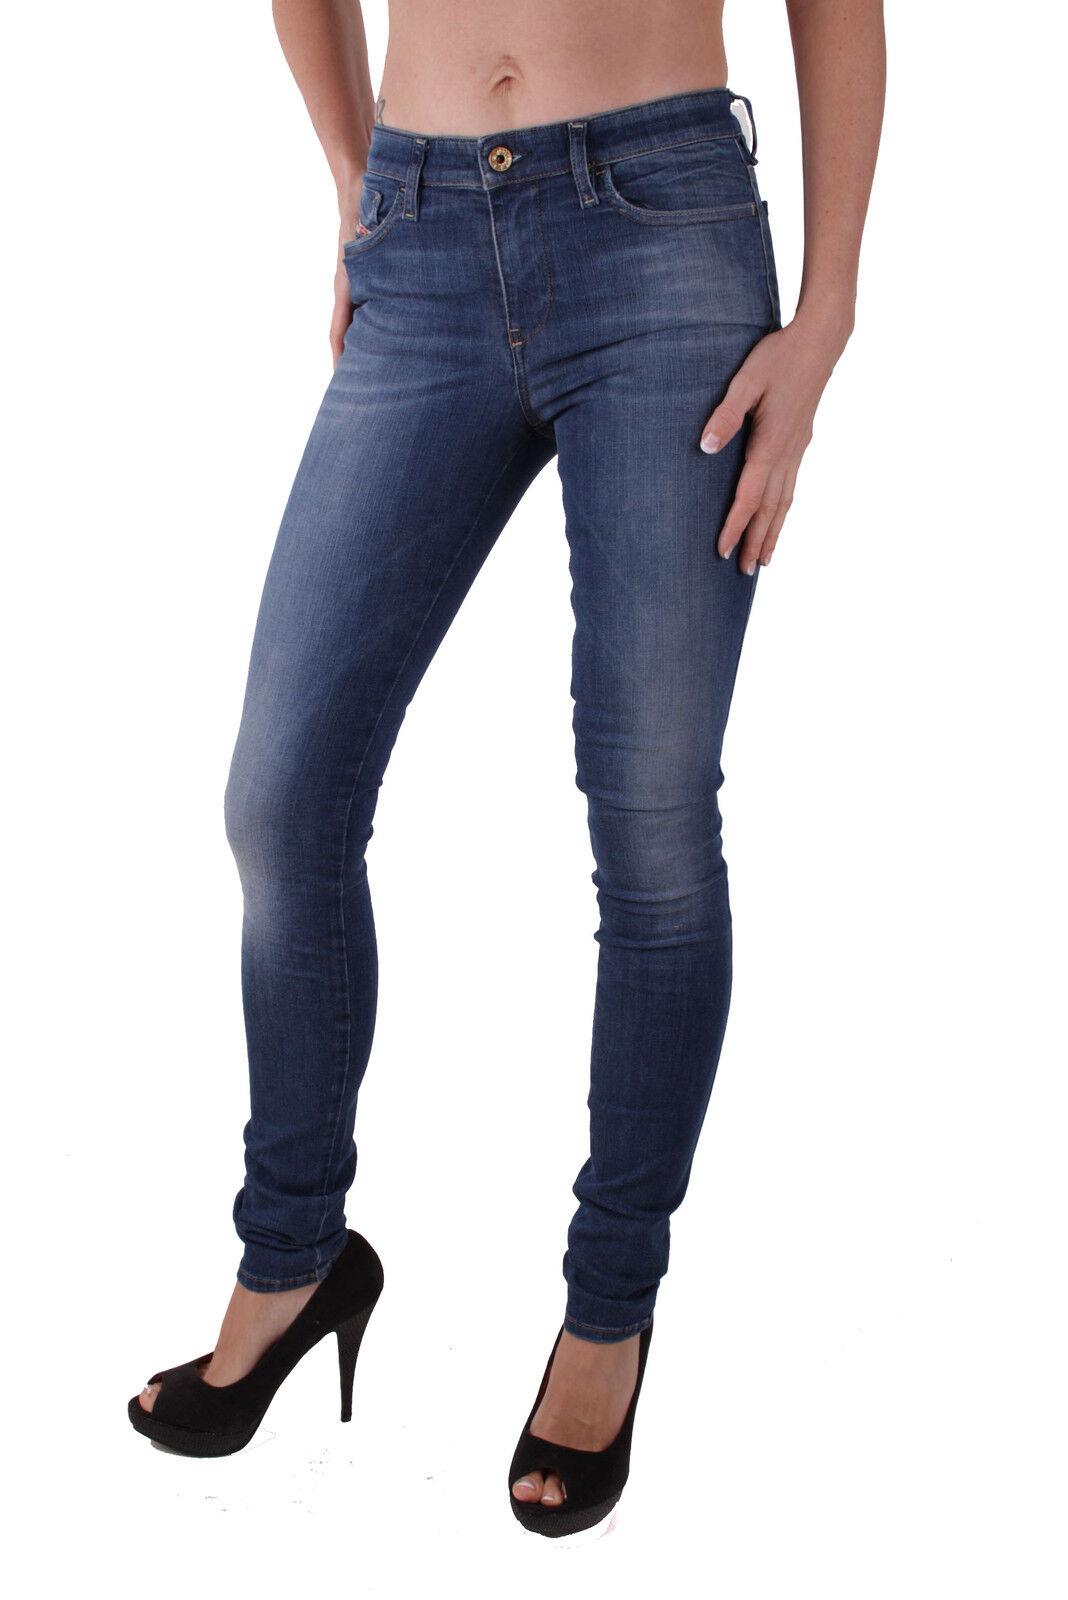 Diesel Skinzee 0826F Damen Jeans Hose Skinny